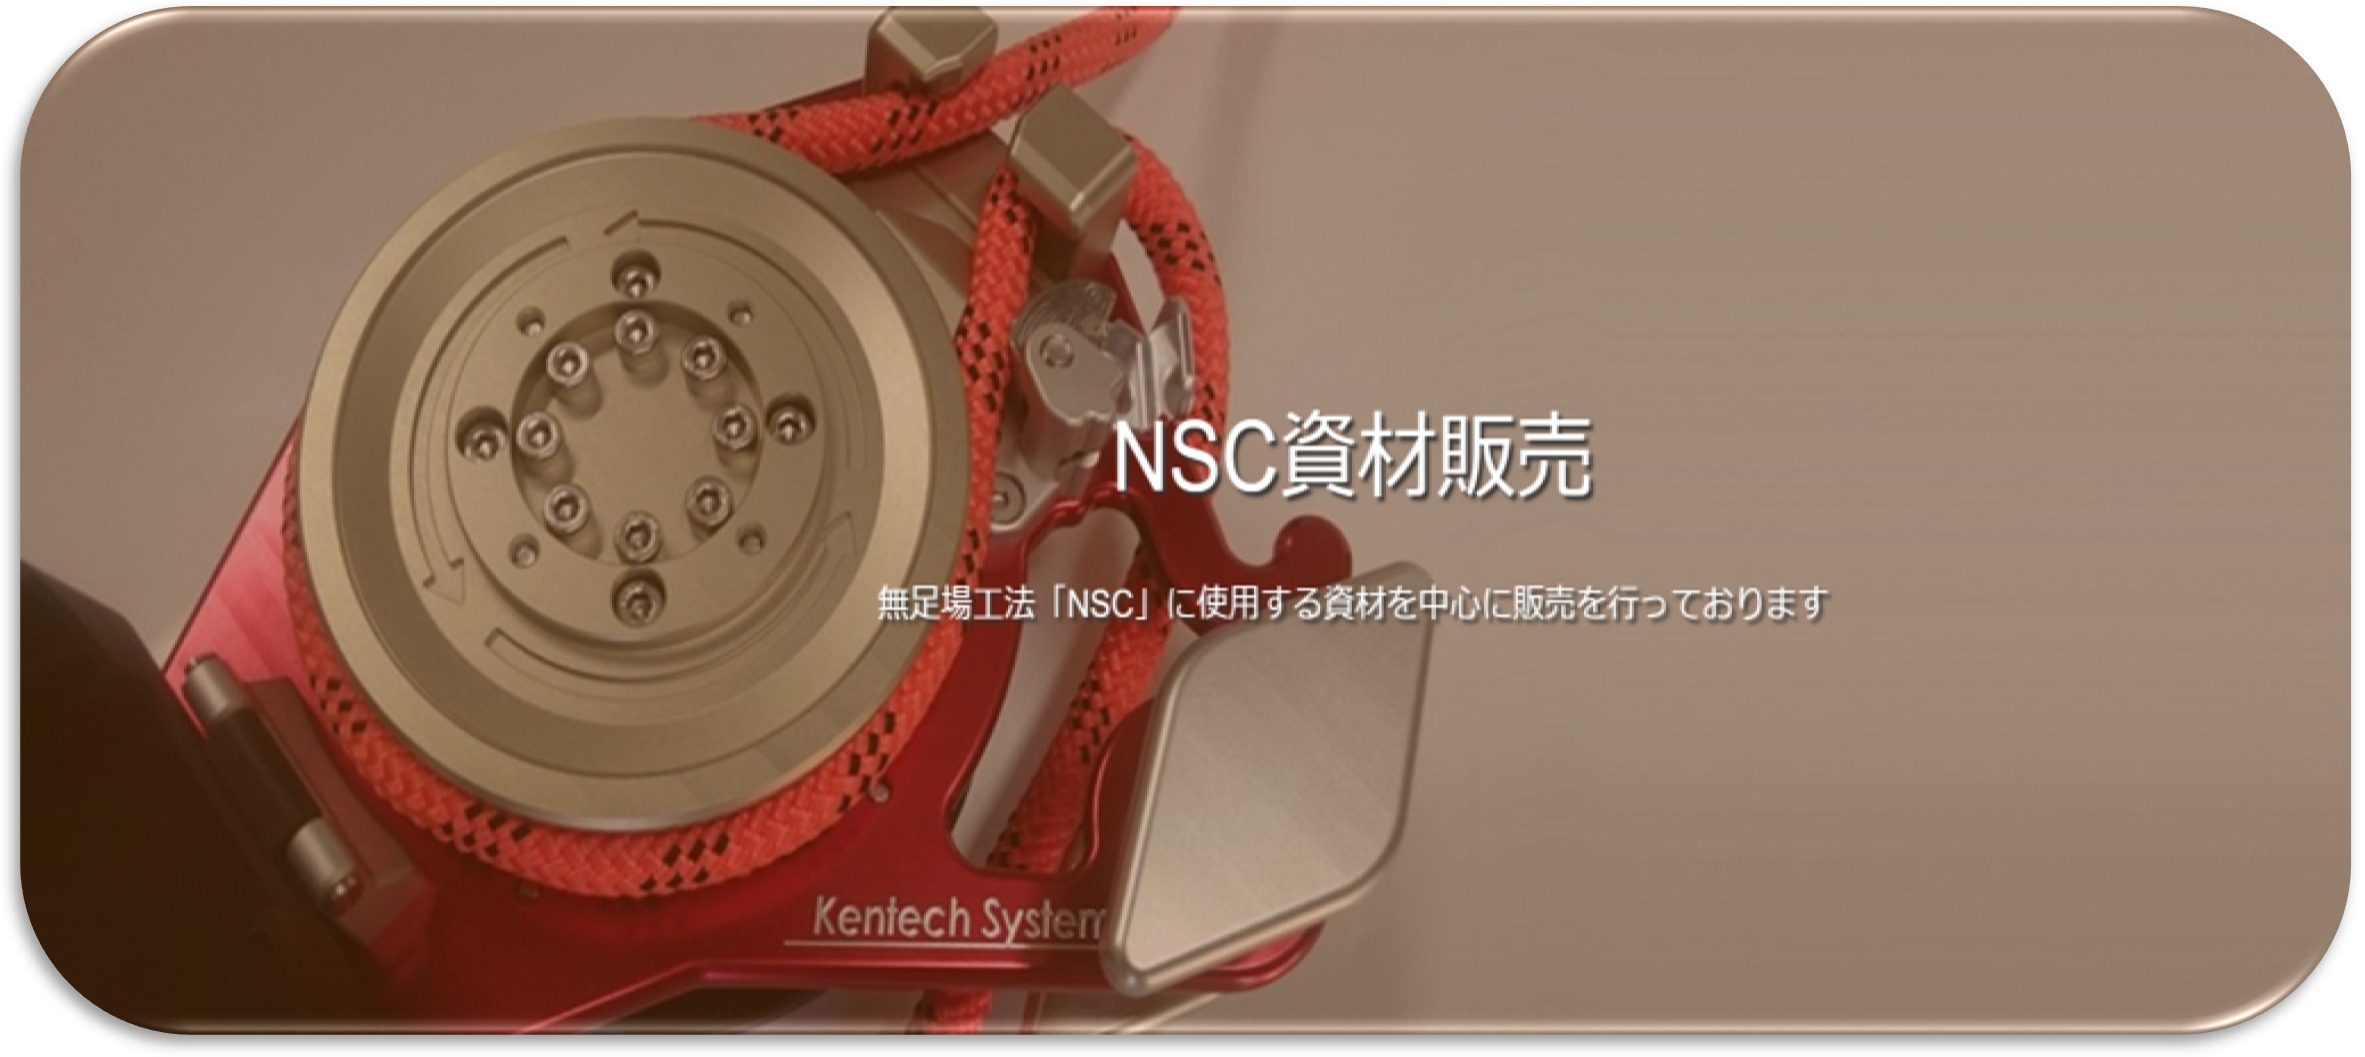 NSC資材販売